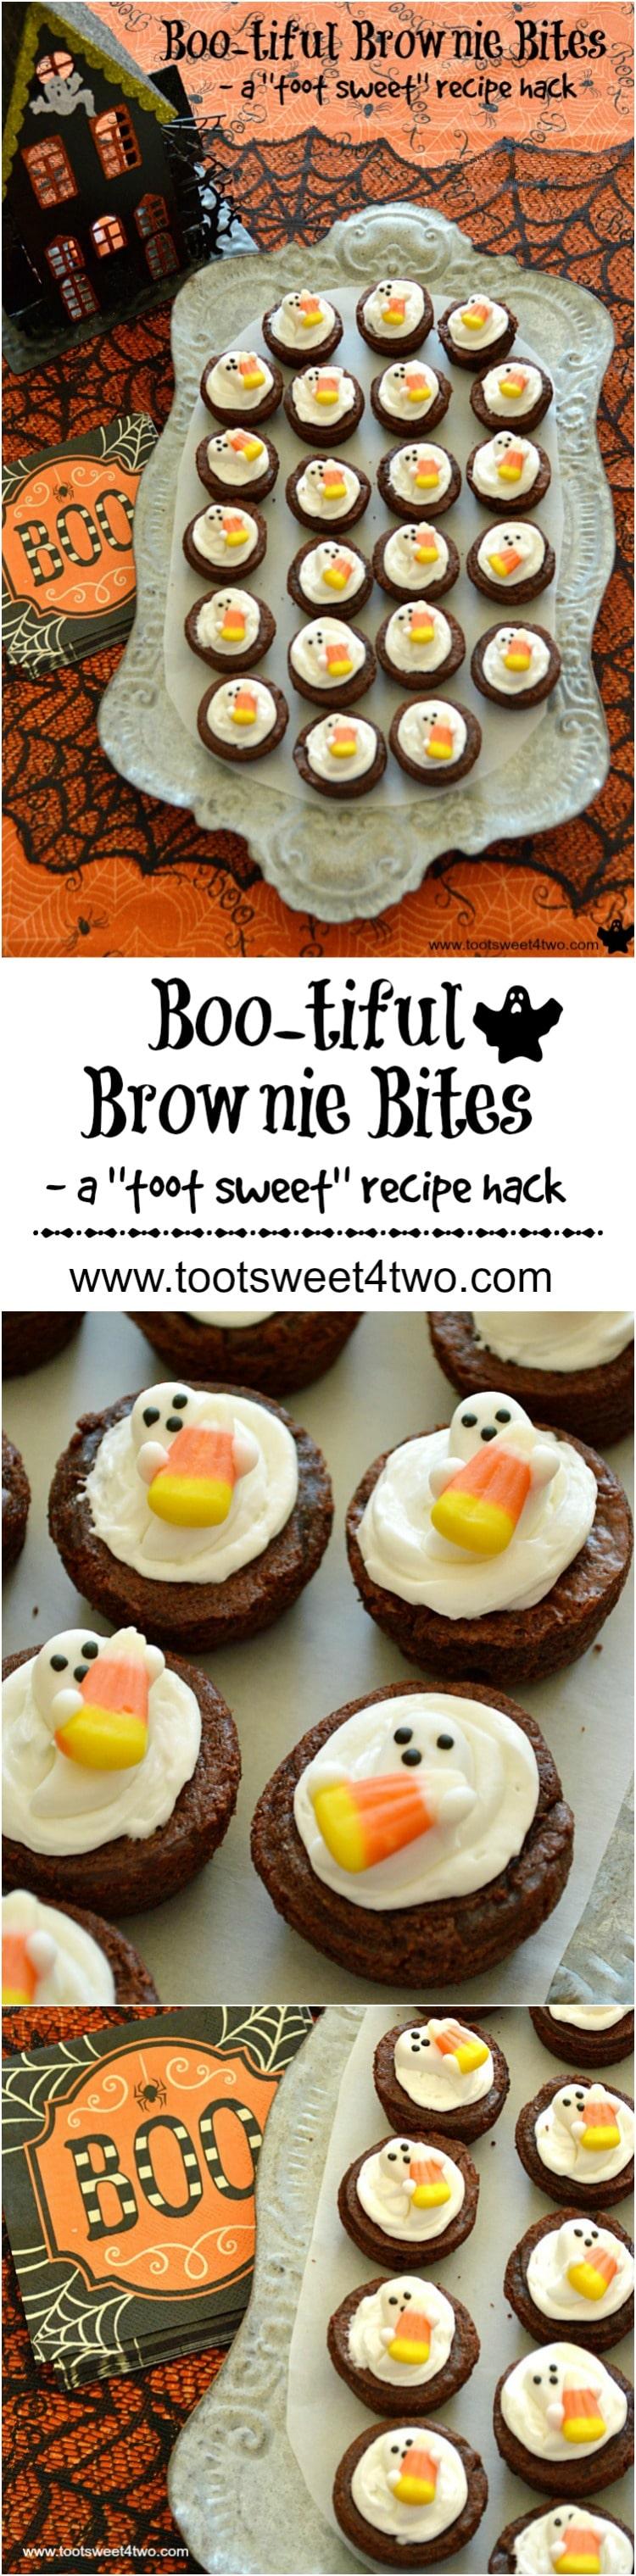 Boo-tiful Brownie Bites Pinterest collage